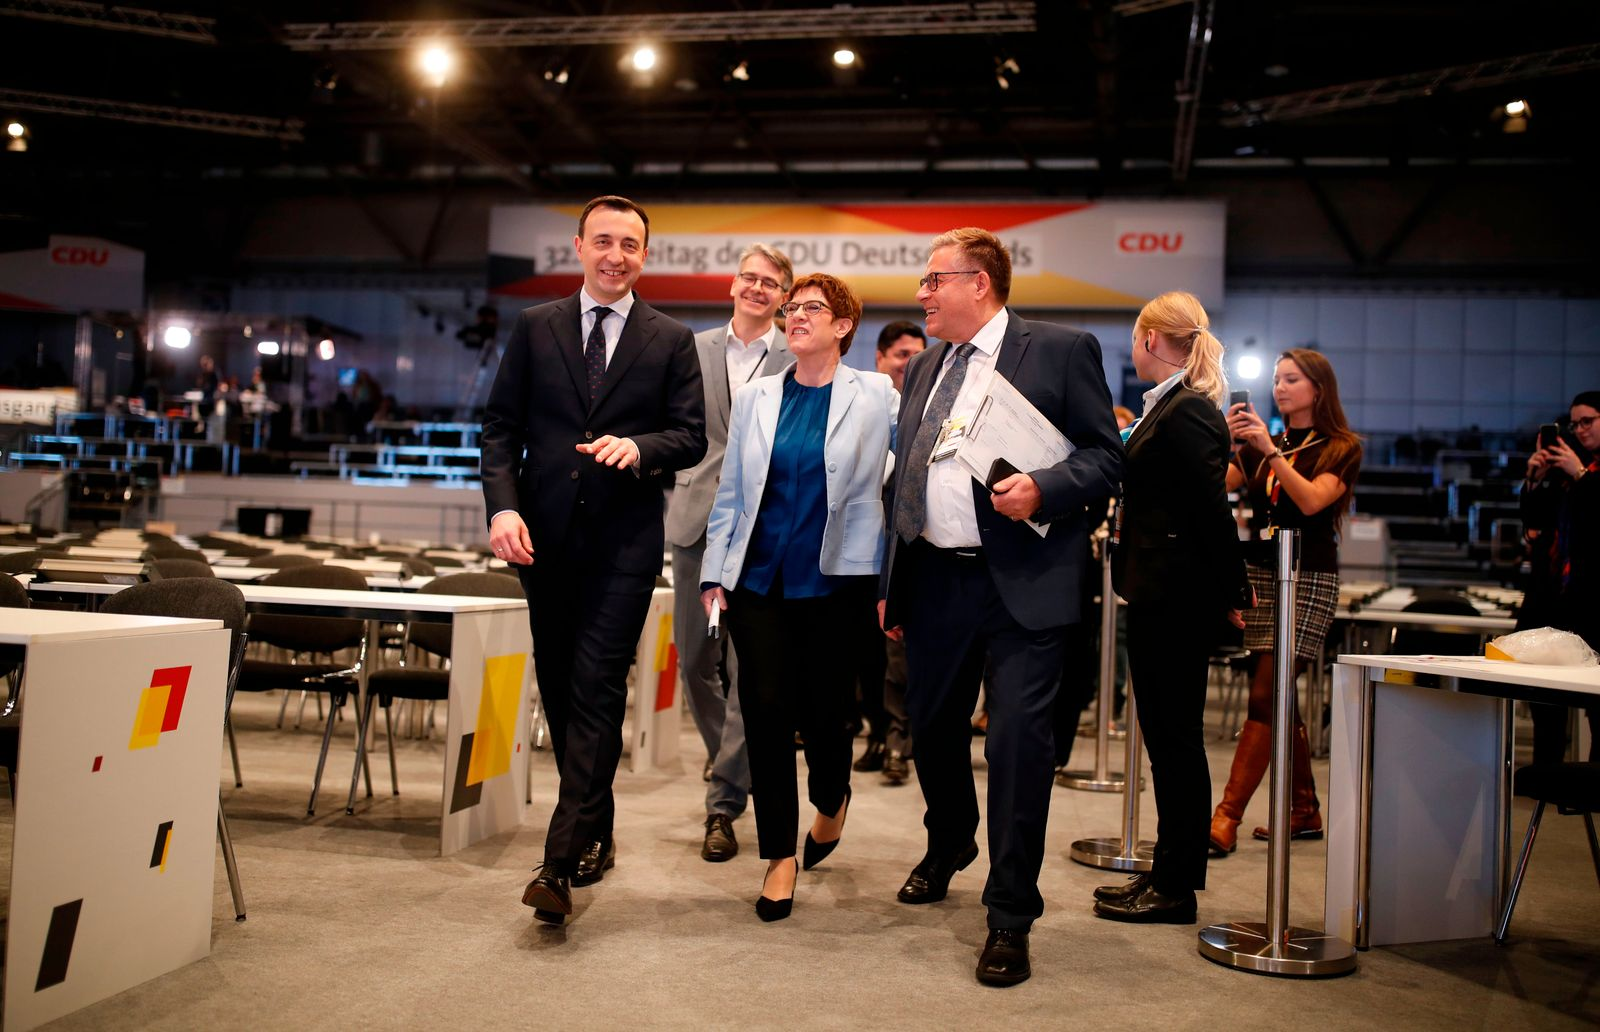 GERMANY-POLITICS-CDU